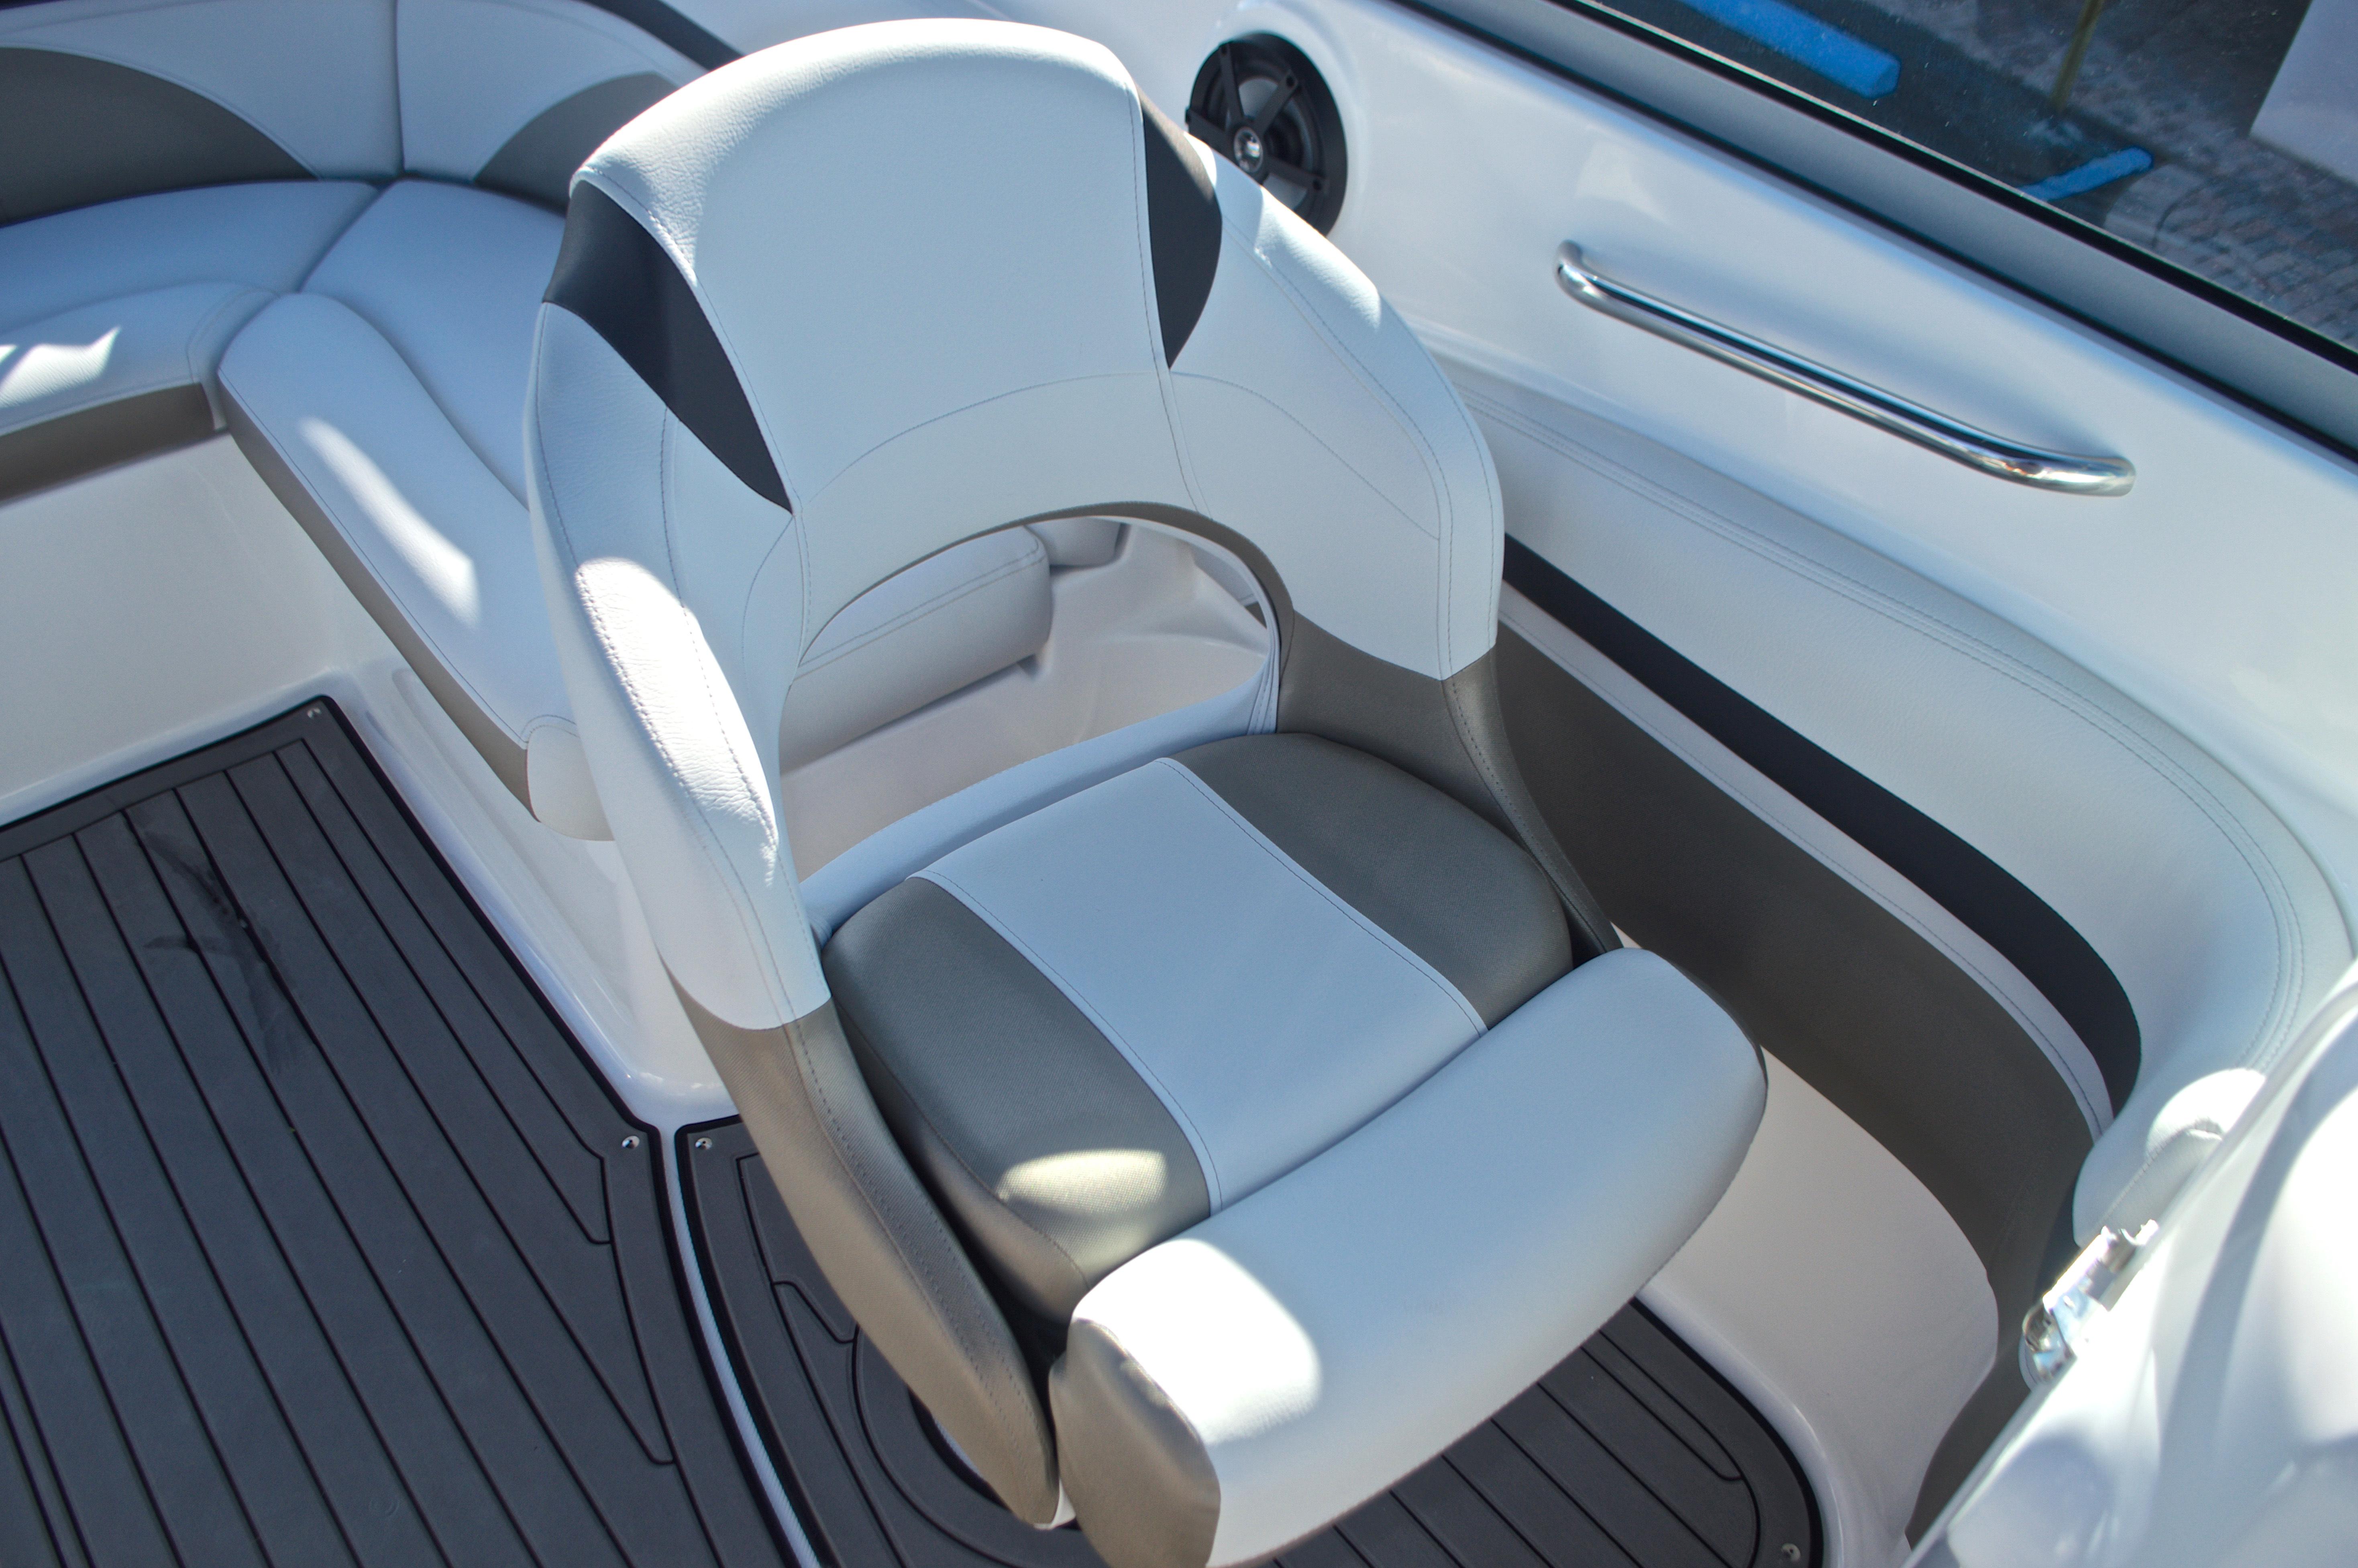 Thumbnail 36 for New 2017 Hurricane SunDeck SD 2400 OB boat for sale in Miami, FL